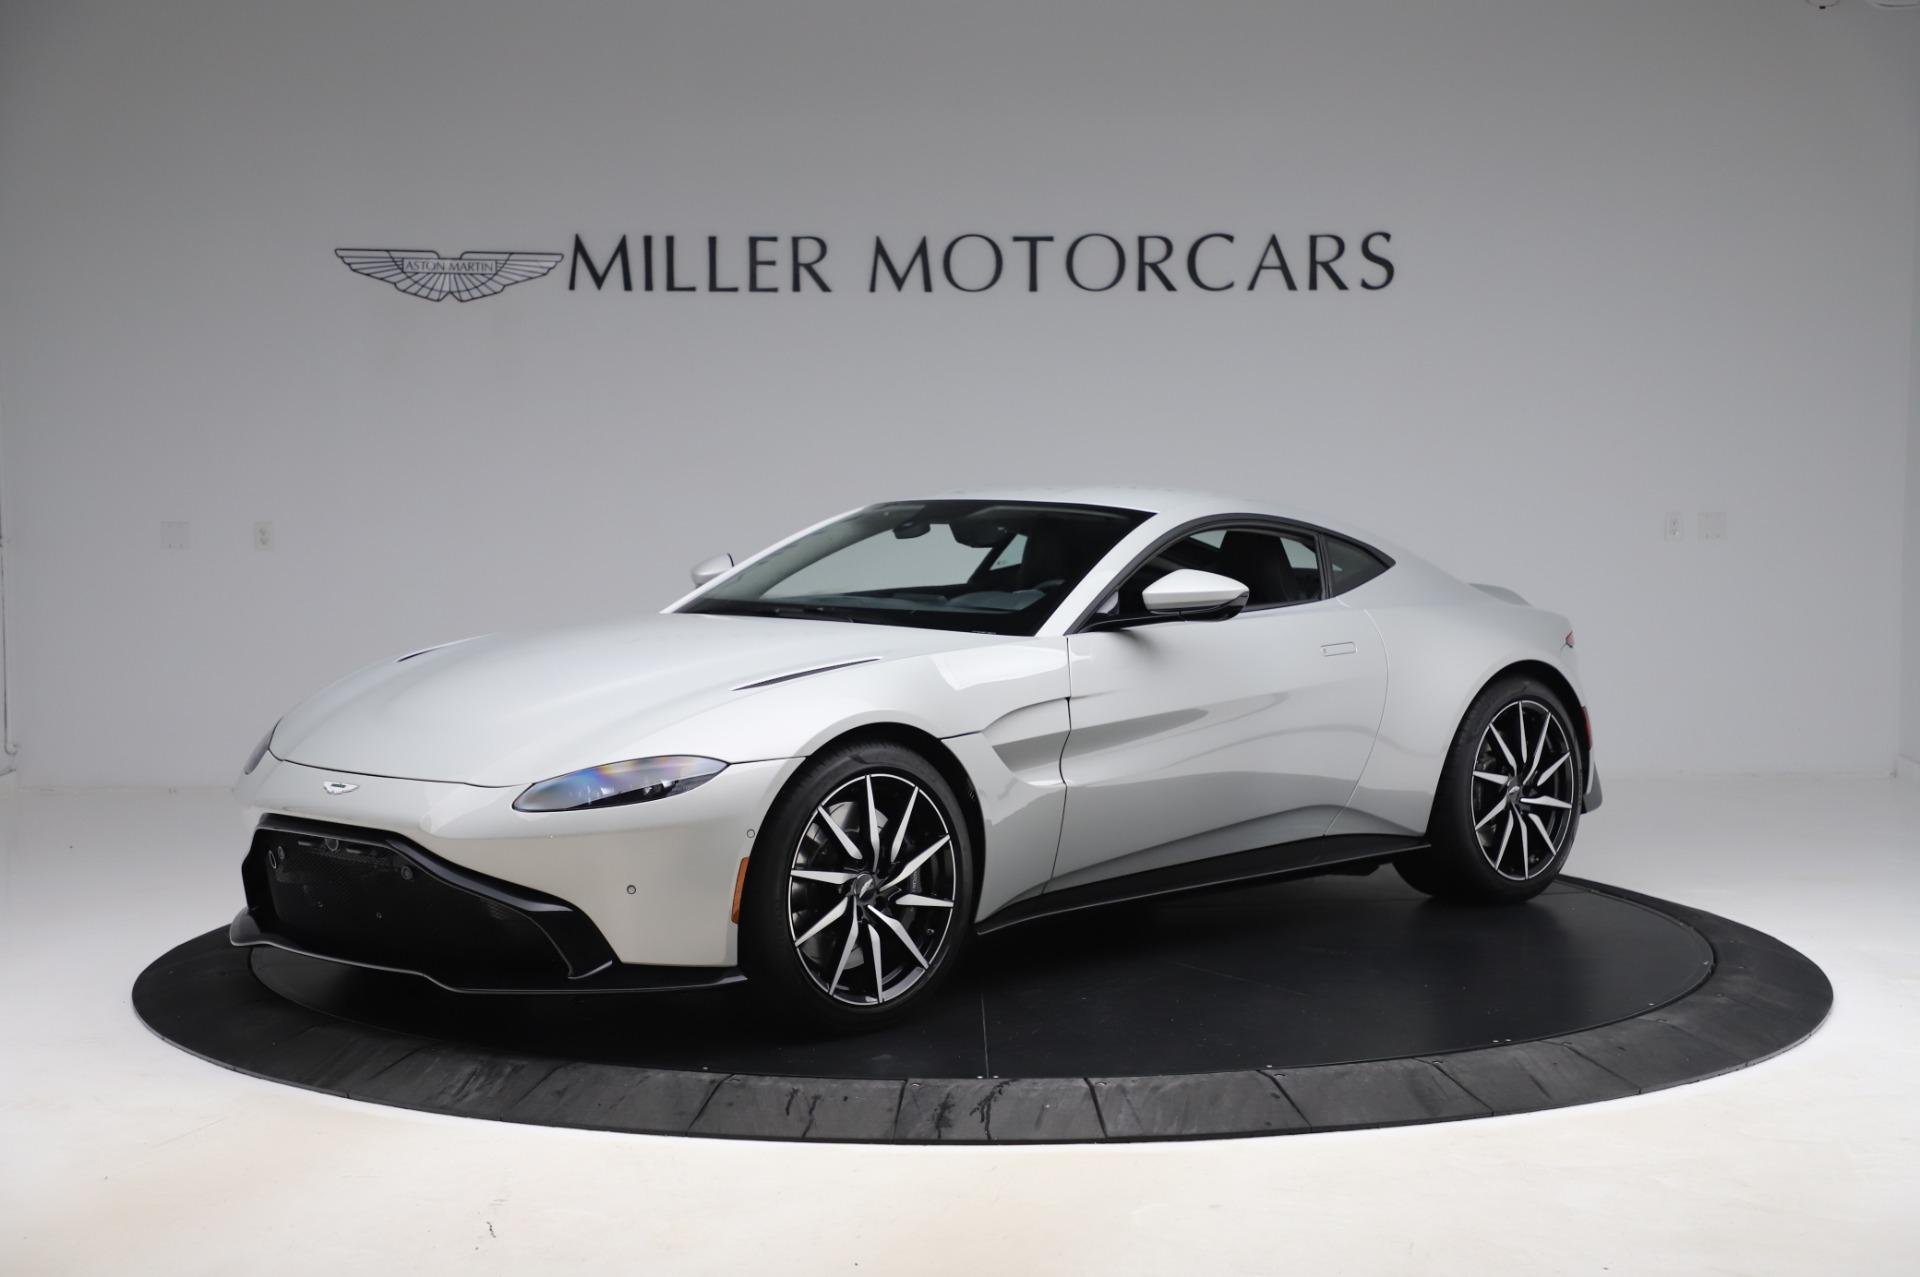 Used 2020 Aston Martin Vantage for sale $149,900 at Alfa Romeo of Westport in Westport CT 06880 1